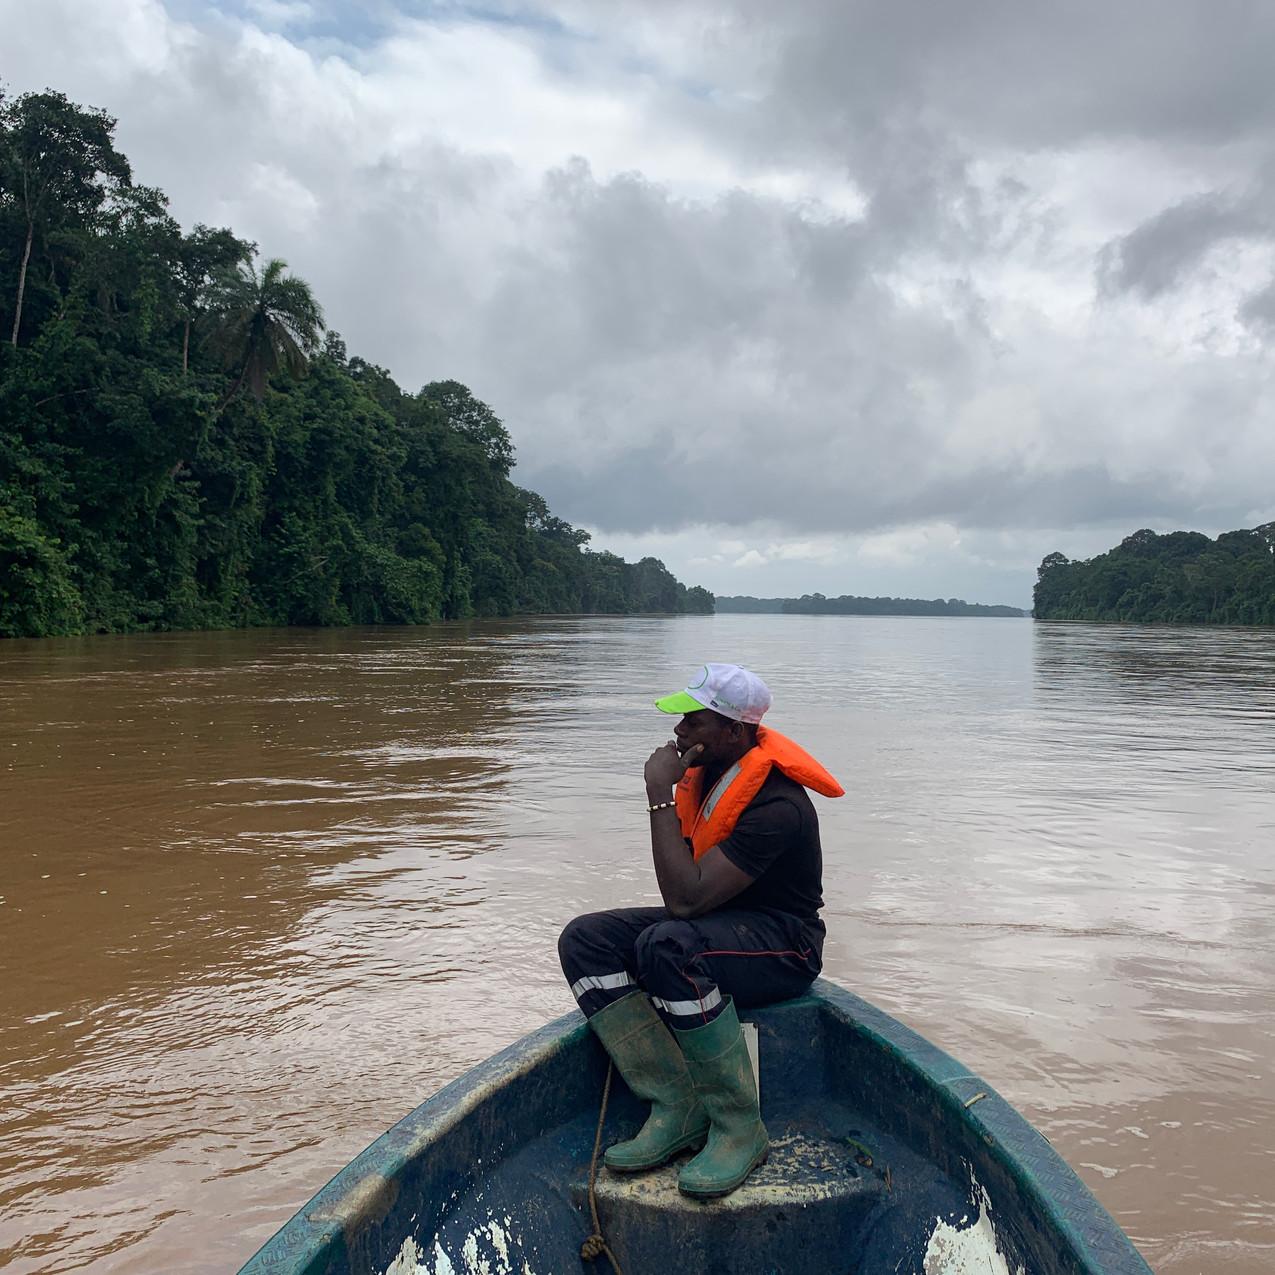 Boat to Pongo Songo